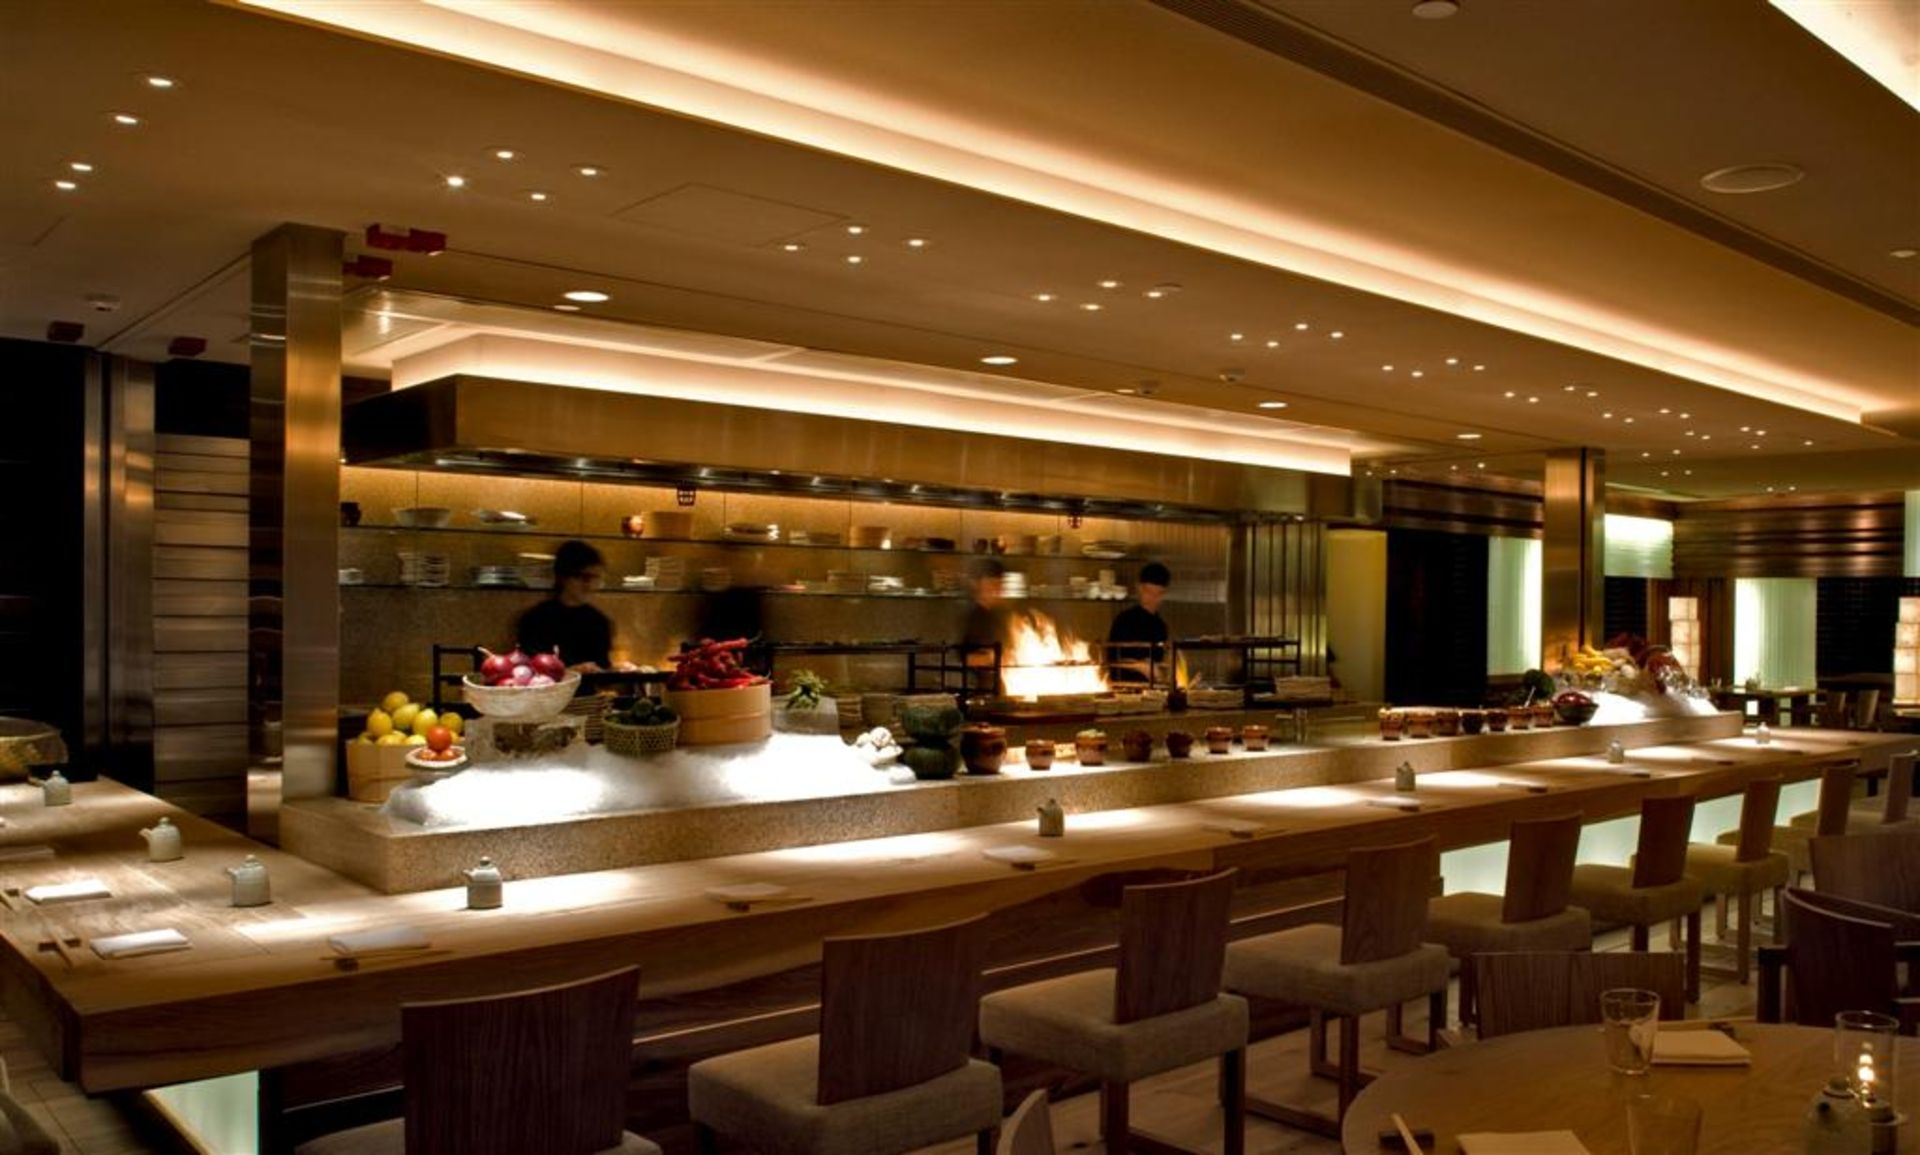 Restaurant Bar Interior Design Ideas USA 5 1 920—1 155 pixels